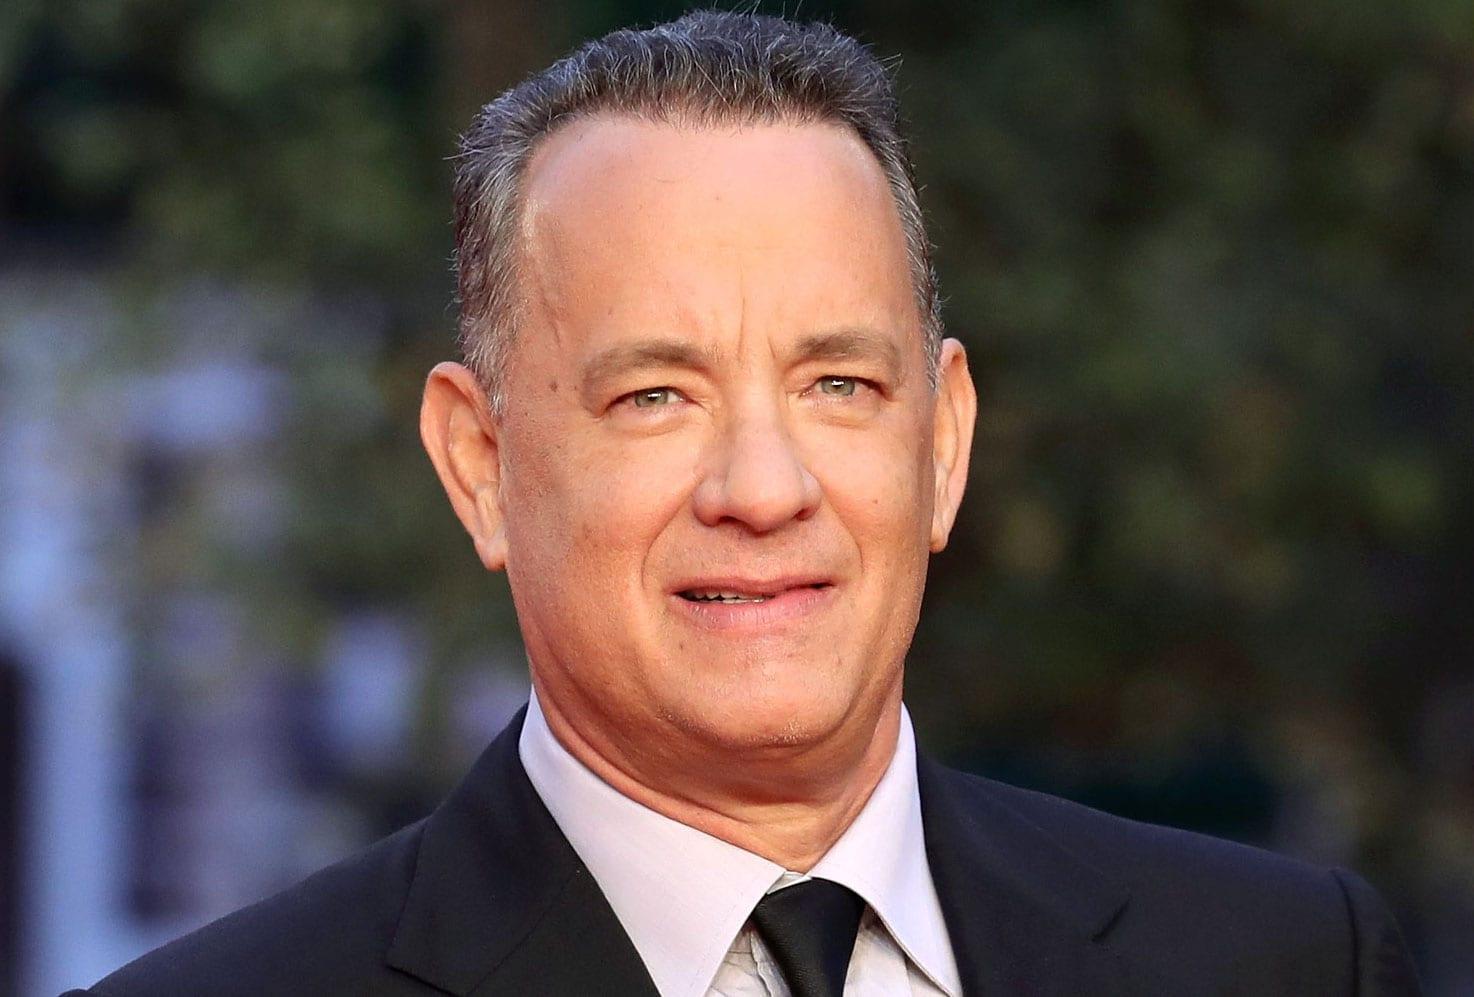 A headshot of actor Tom Hanks